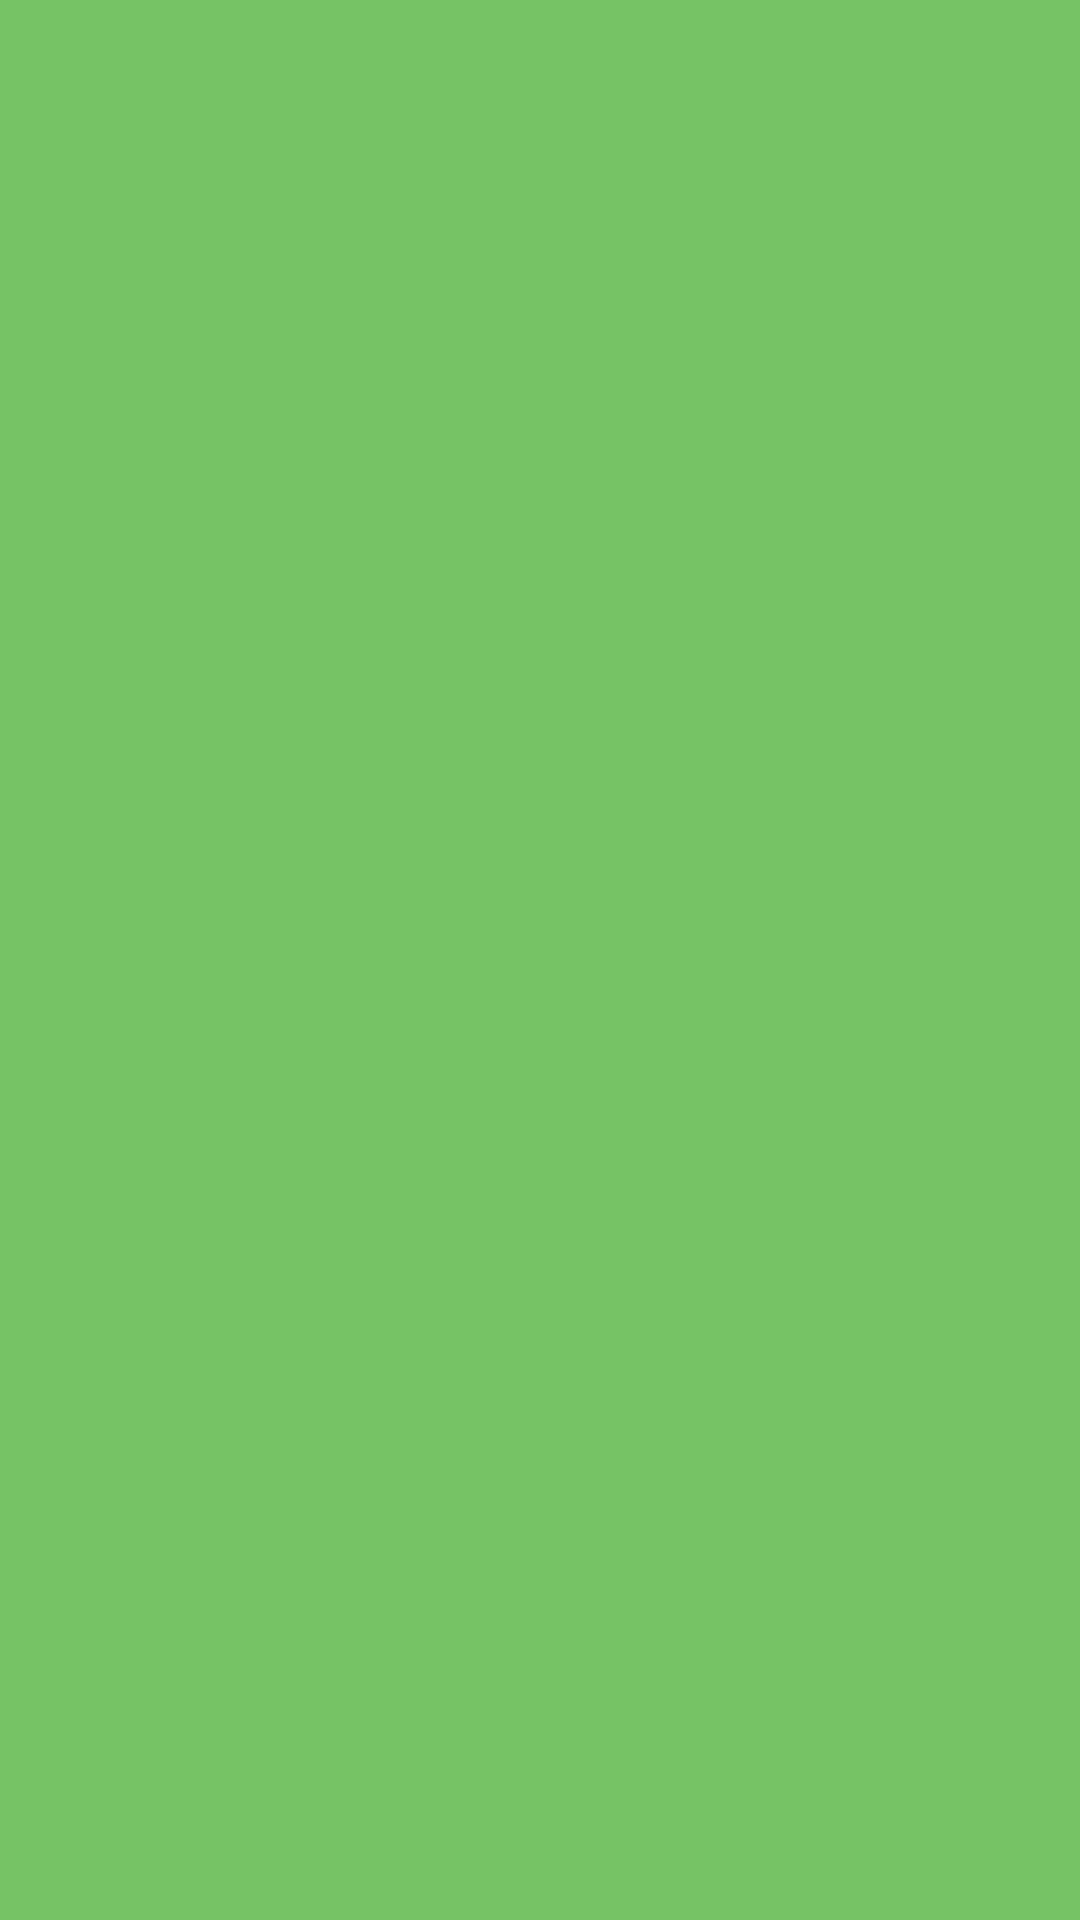 1080x1920 Mantis Solid Color Background